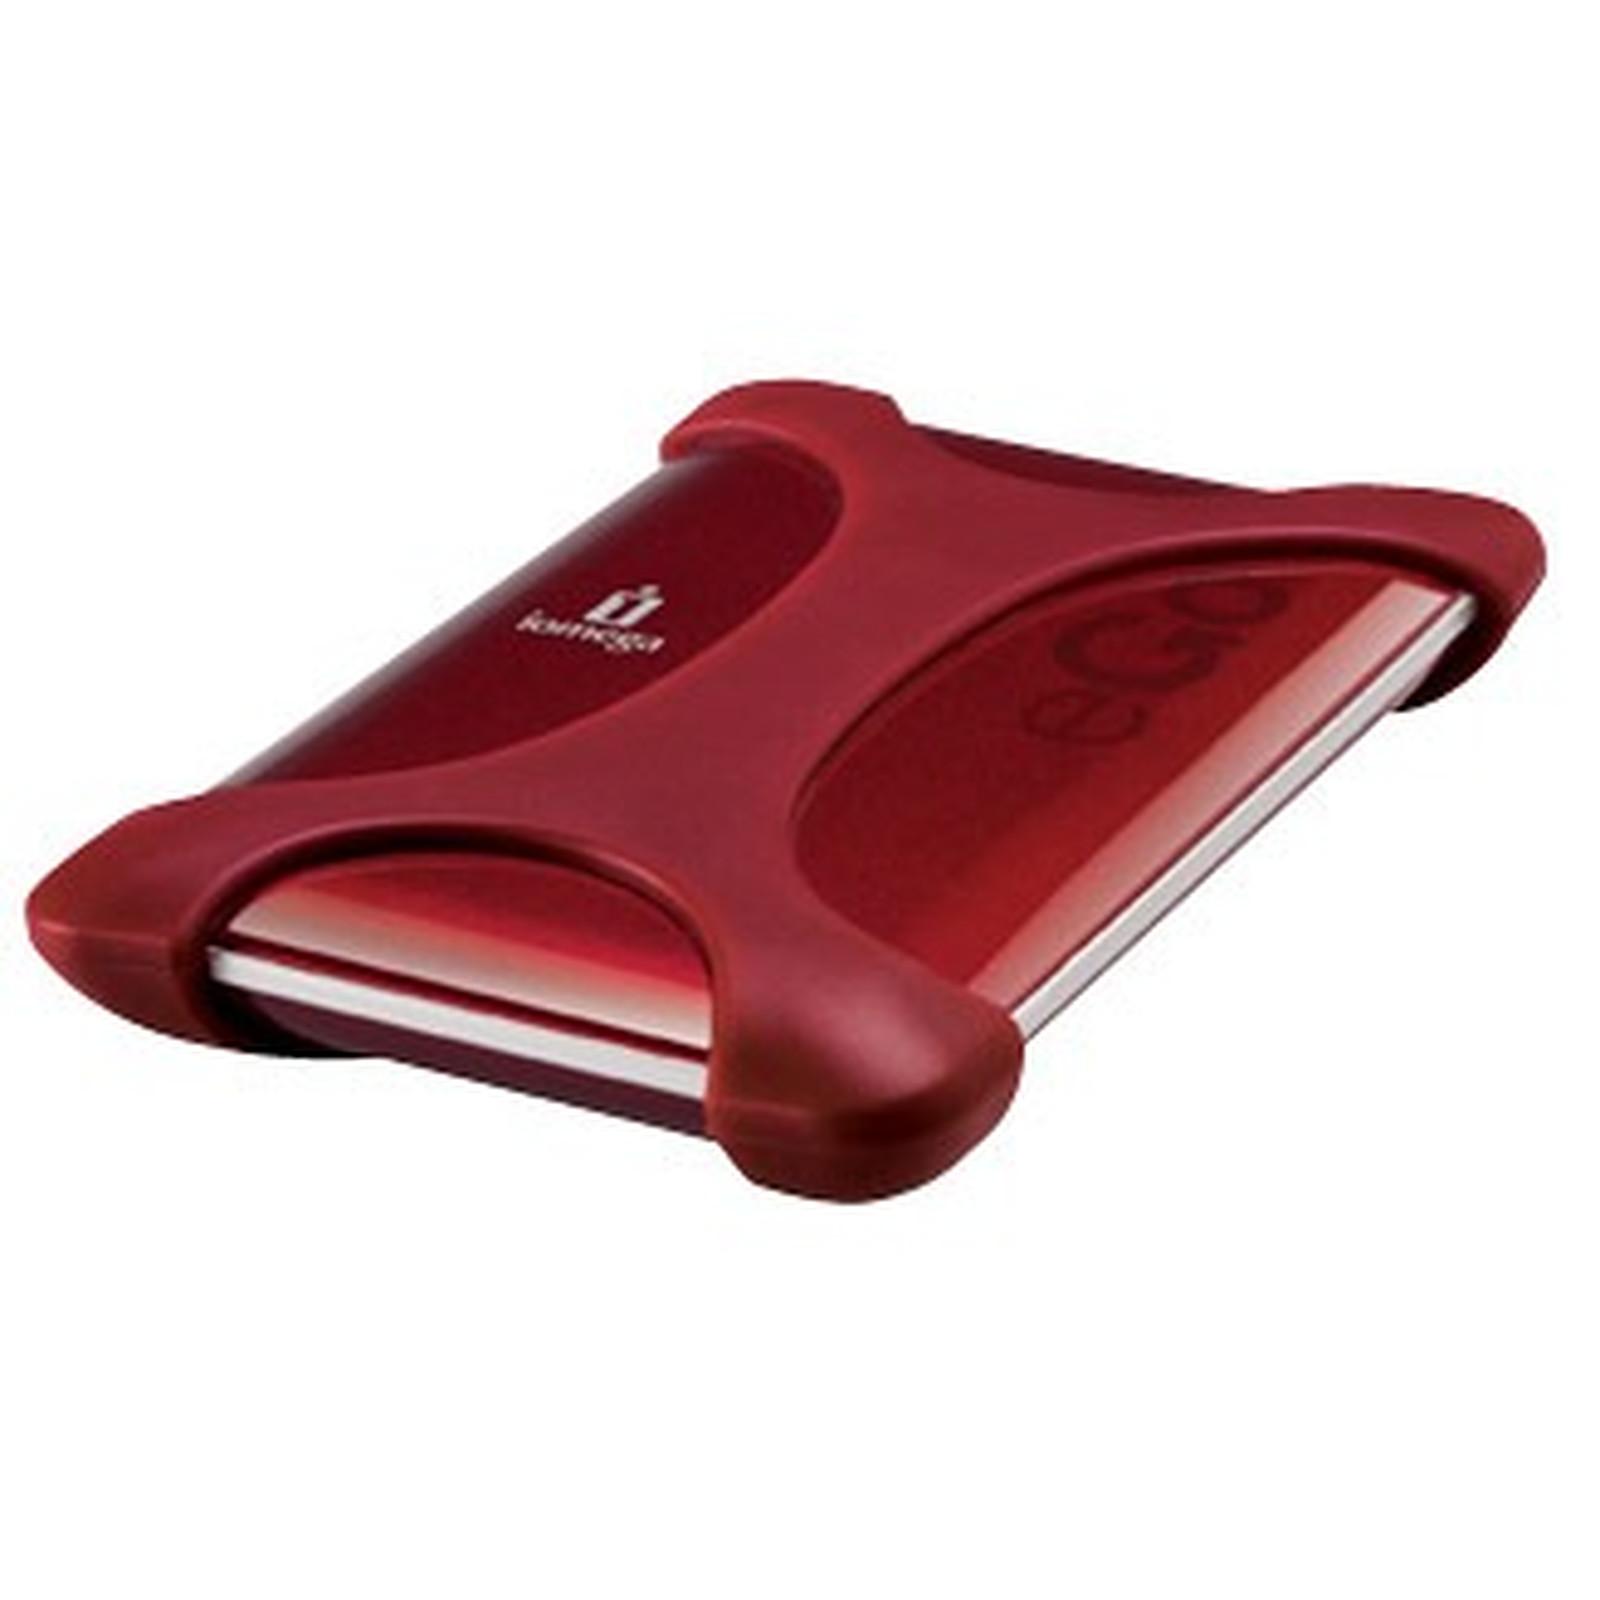 Iomega eGo Red 3.0 500 Go (USB 3.0)